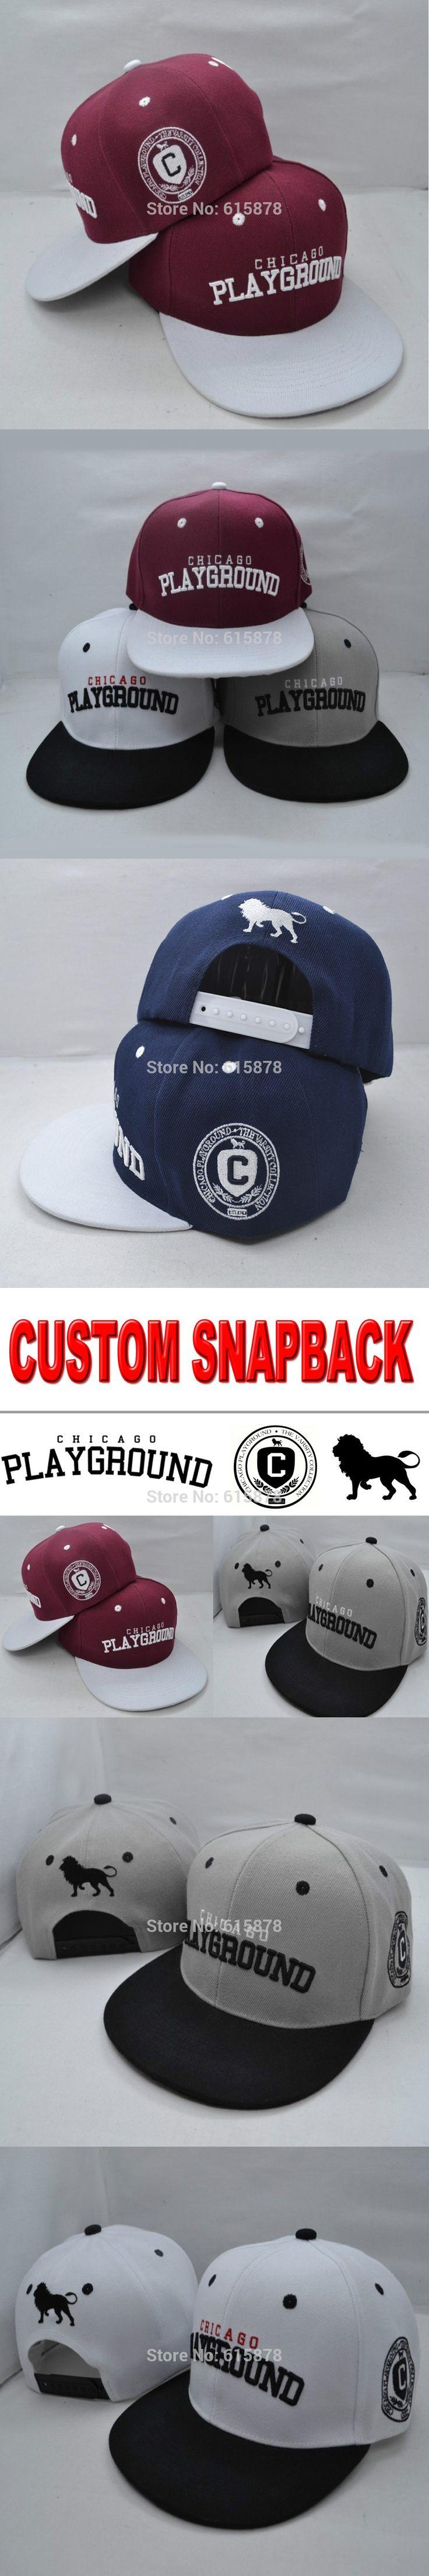 2017 Custom Embroidered Snapback Custom Logo 3D Embroidery Flat bill Cap Customize Snapback Hats Wholesale Free Shipping